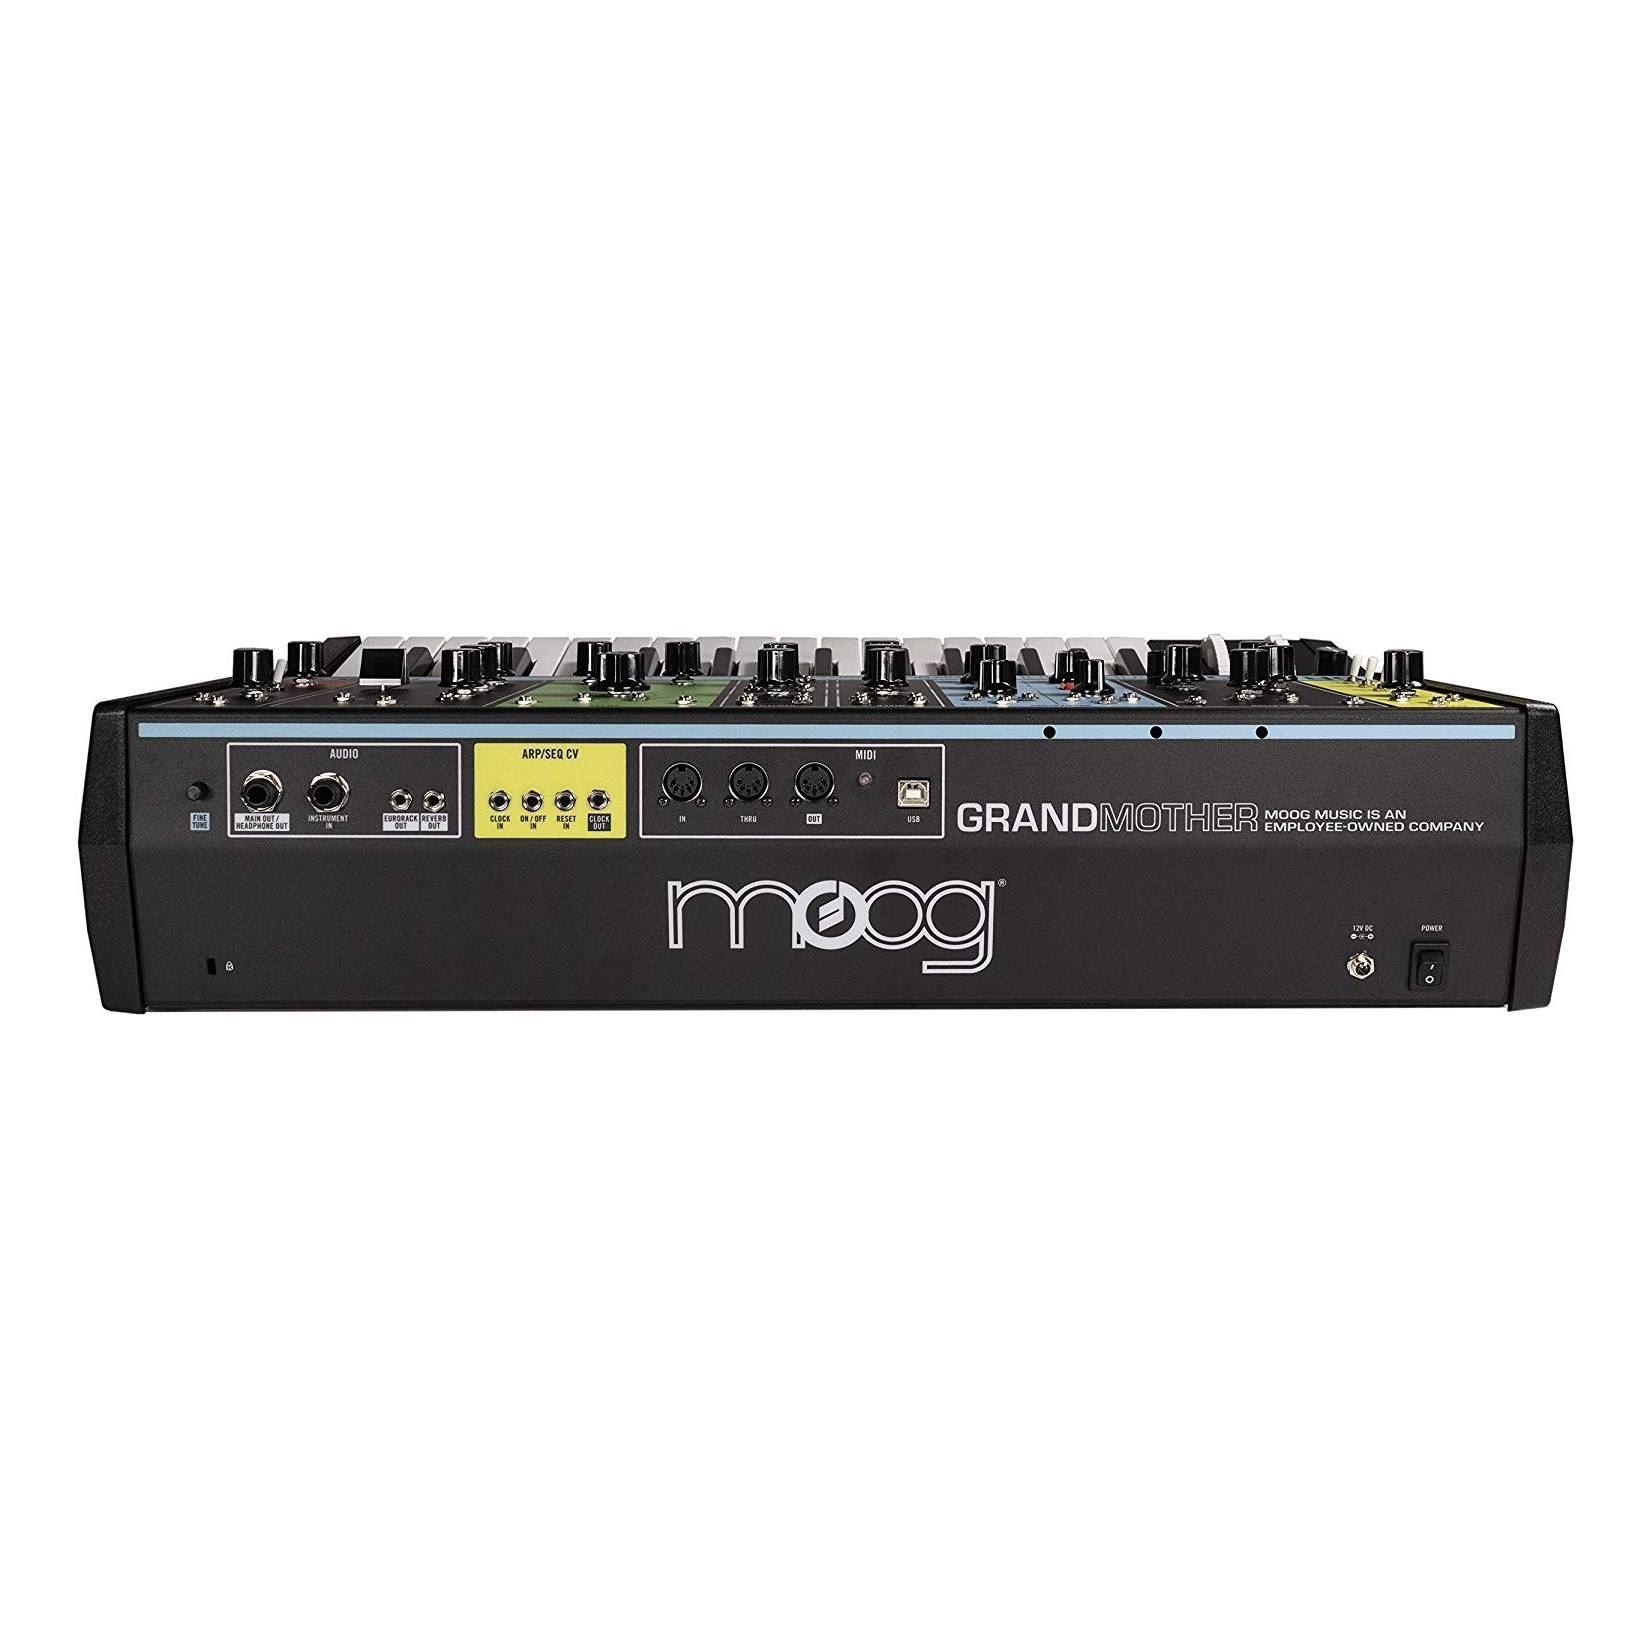 Moog Grandmother Semi-Modular Analogue Synthesizer - Back